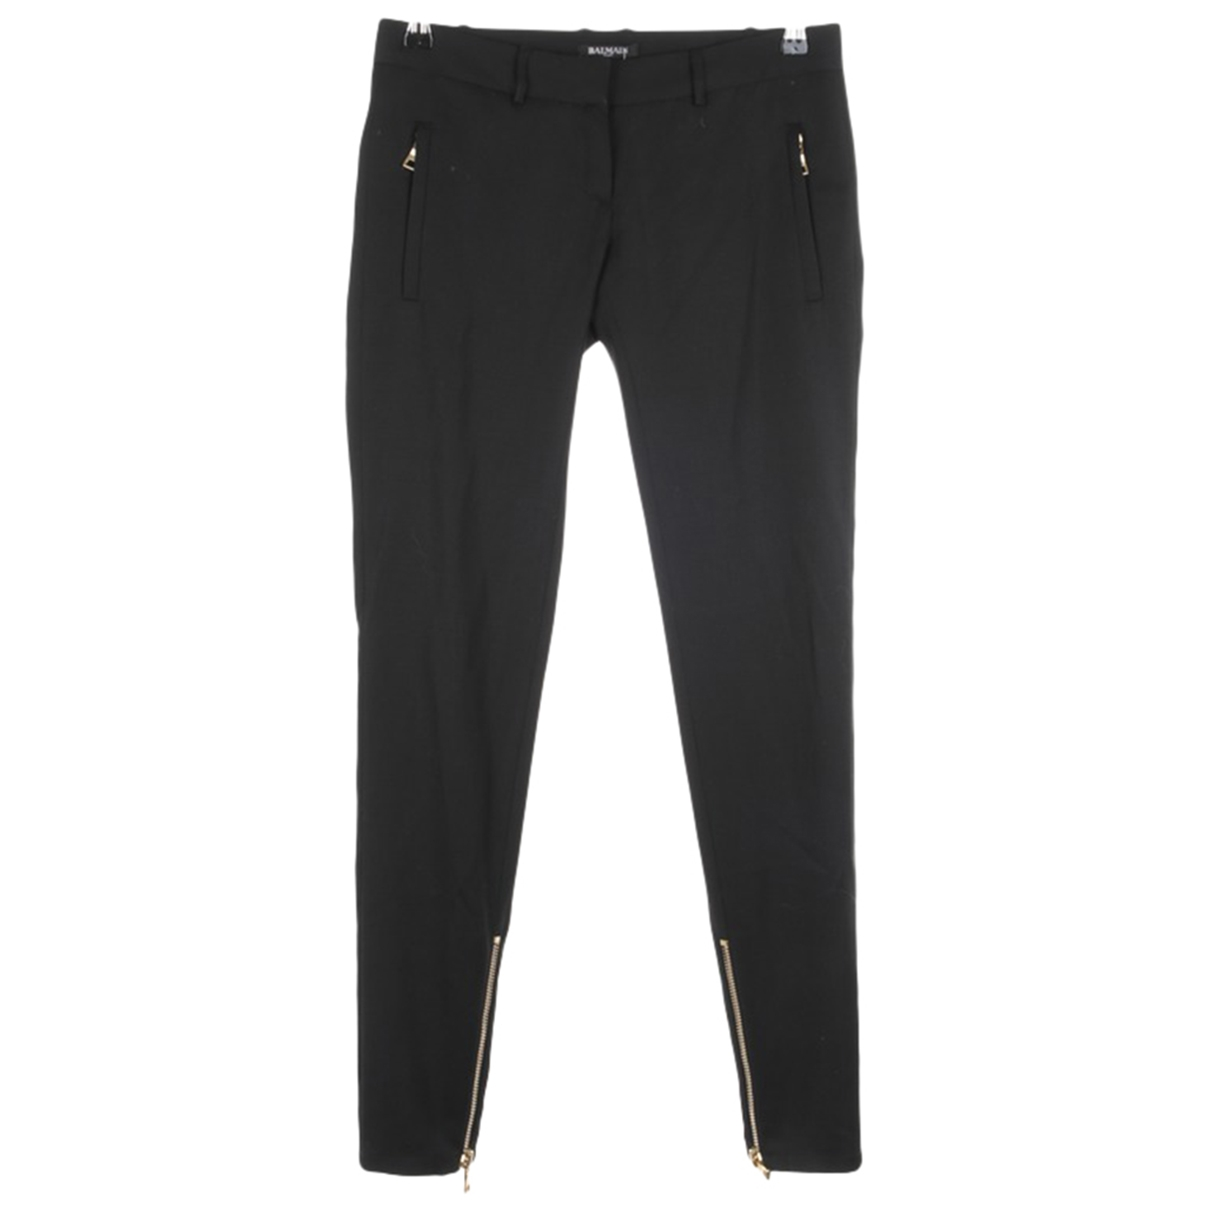 Balmain \N Black Wool Trousers for Women 34 FR